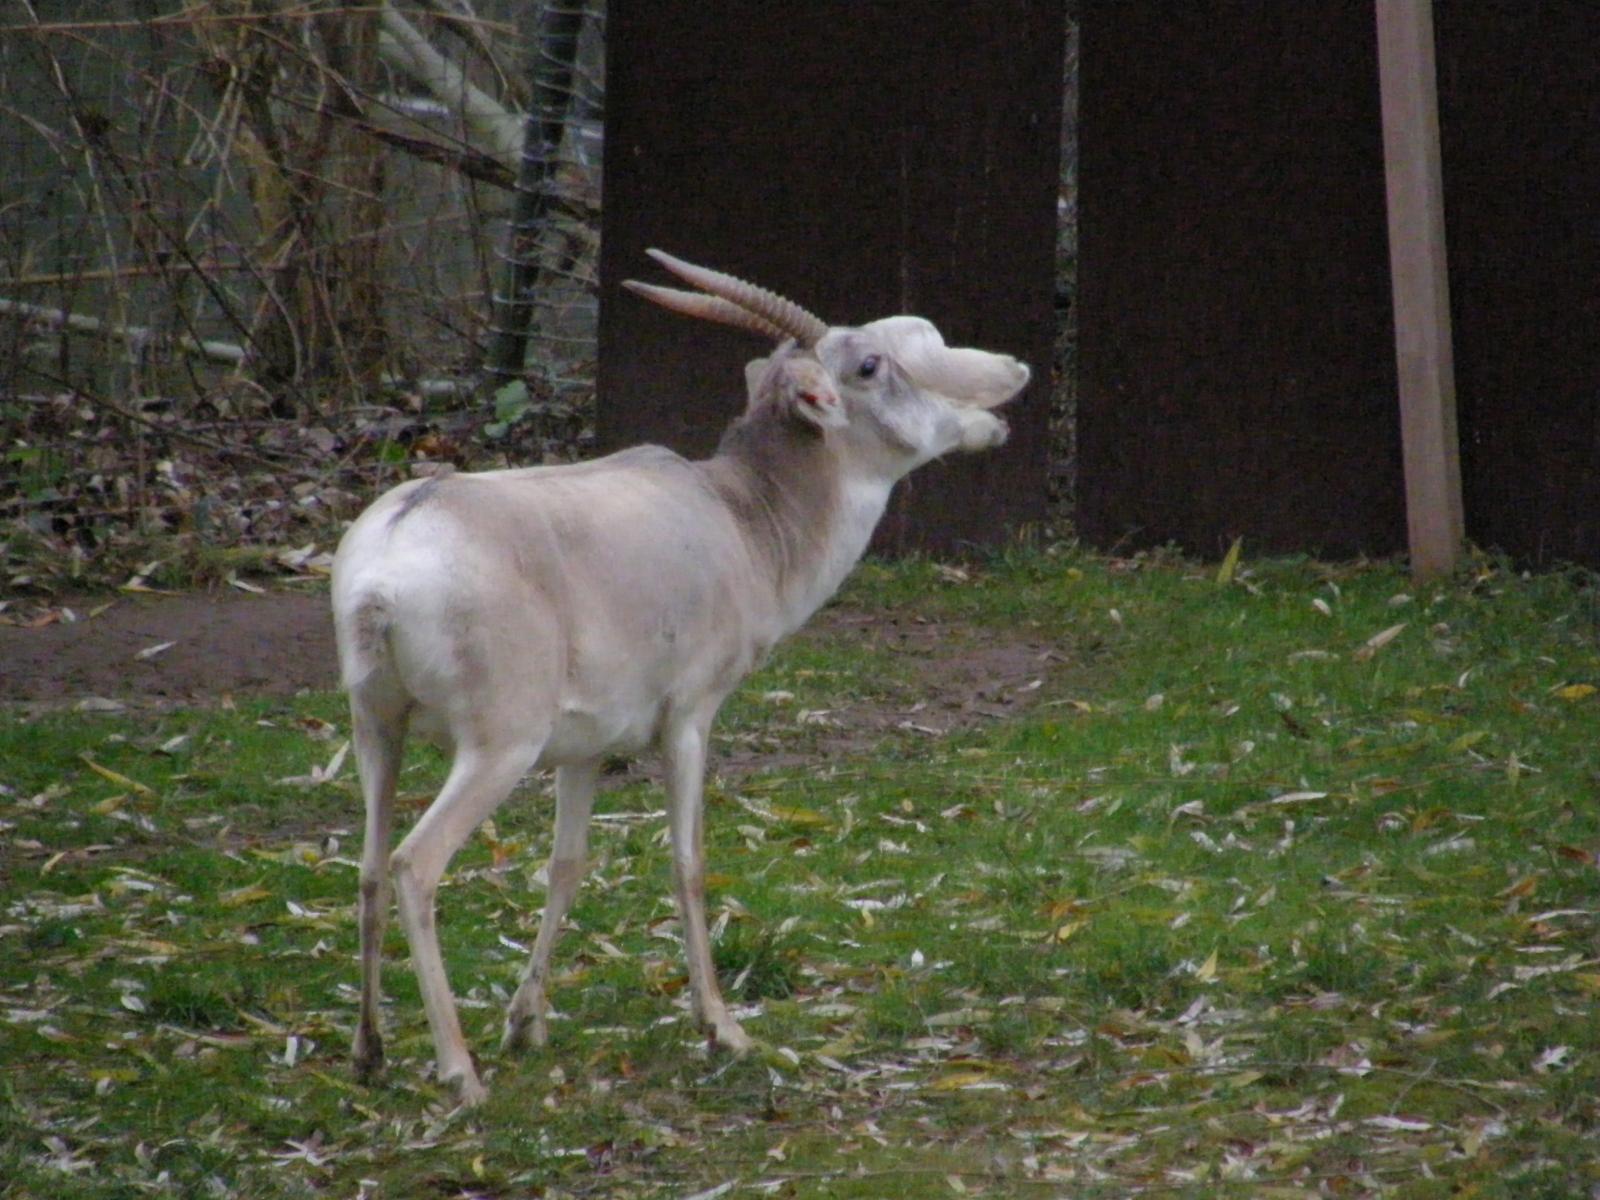 Kazakhstan Saiga Antelope Population Shows Signs Of